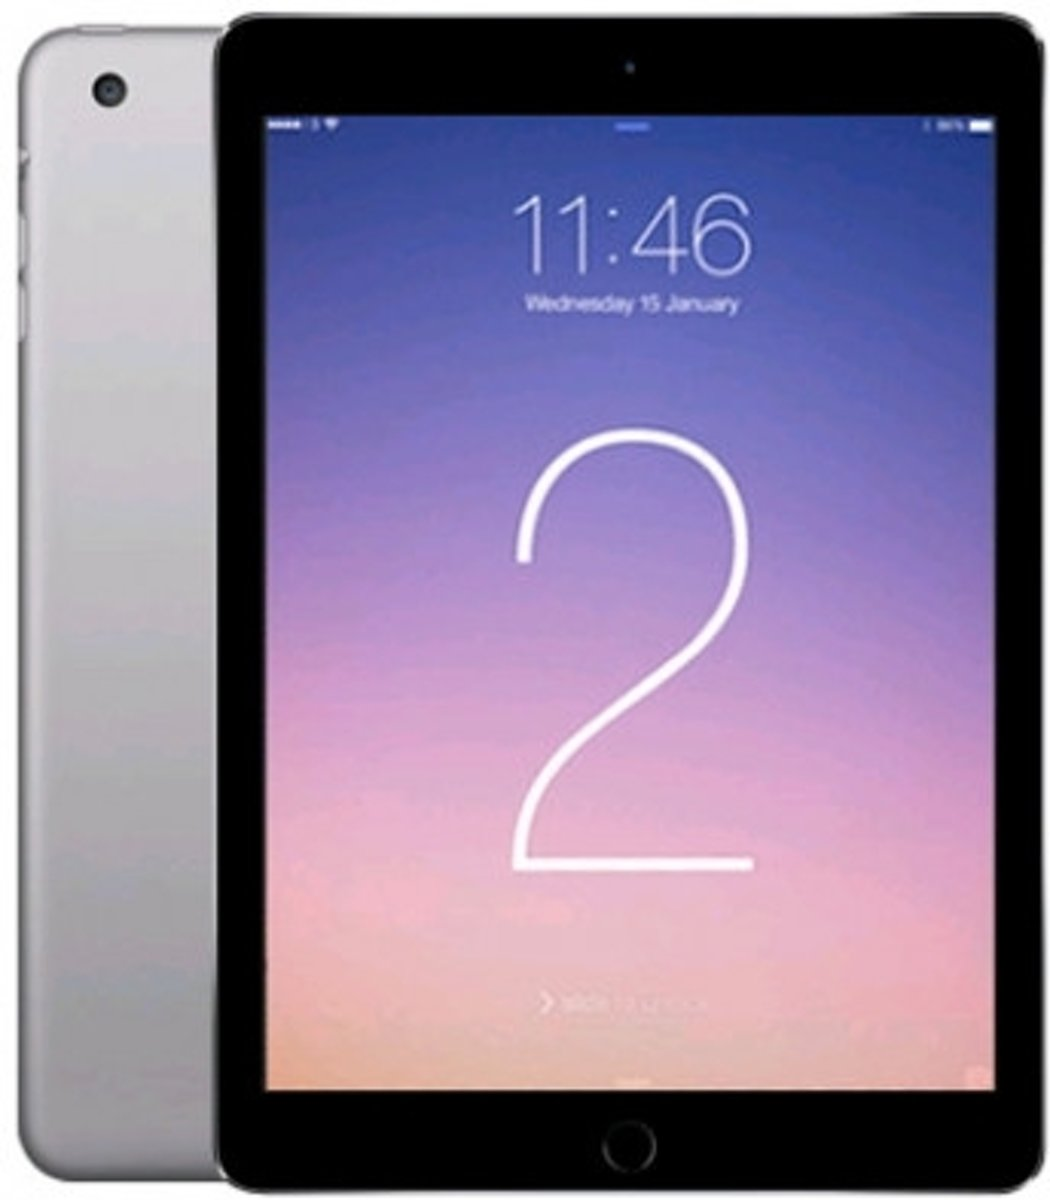 iUsed Refurbished (MGKL2) iPad Air 2 - 9,7 inch - 64 GB - WiFi - Space Gray